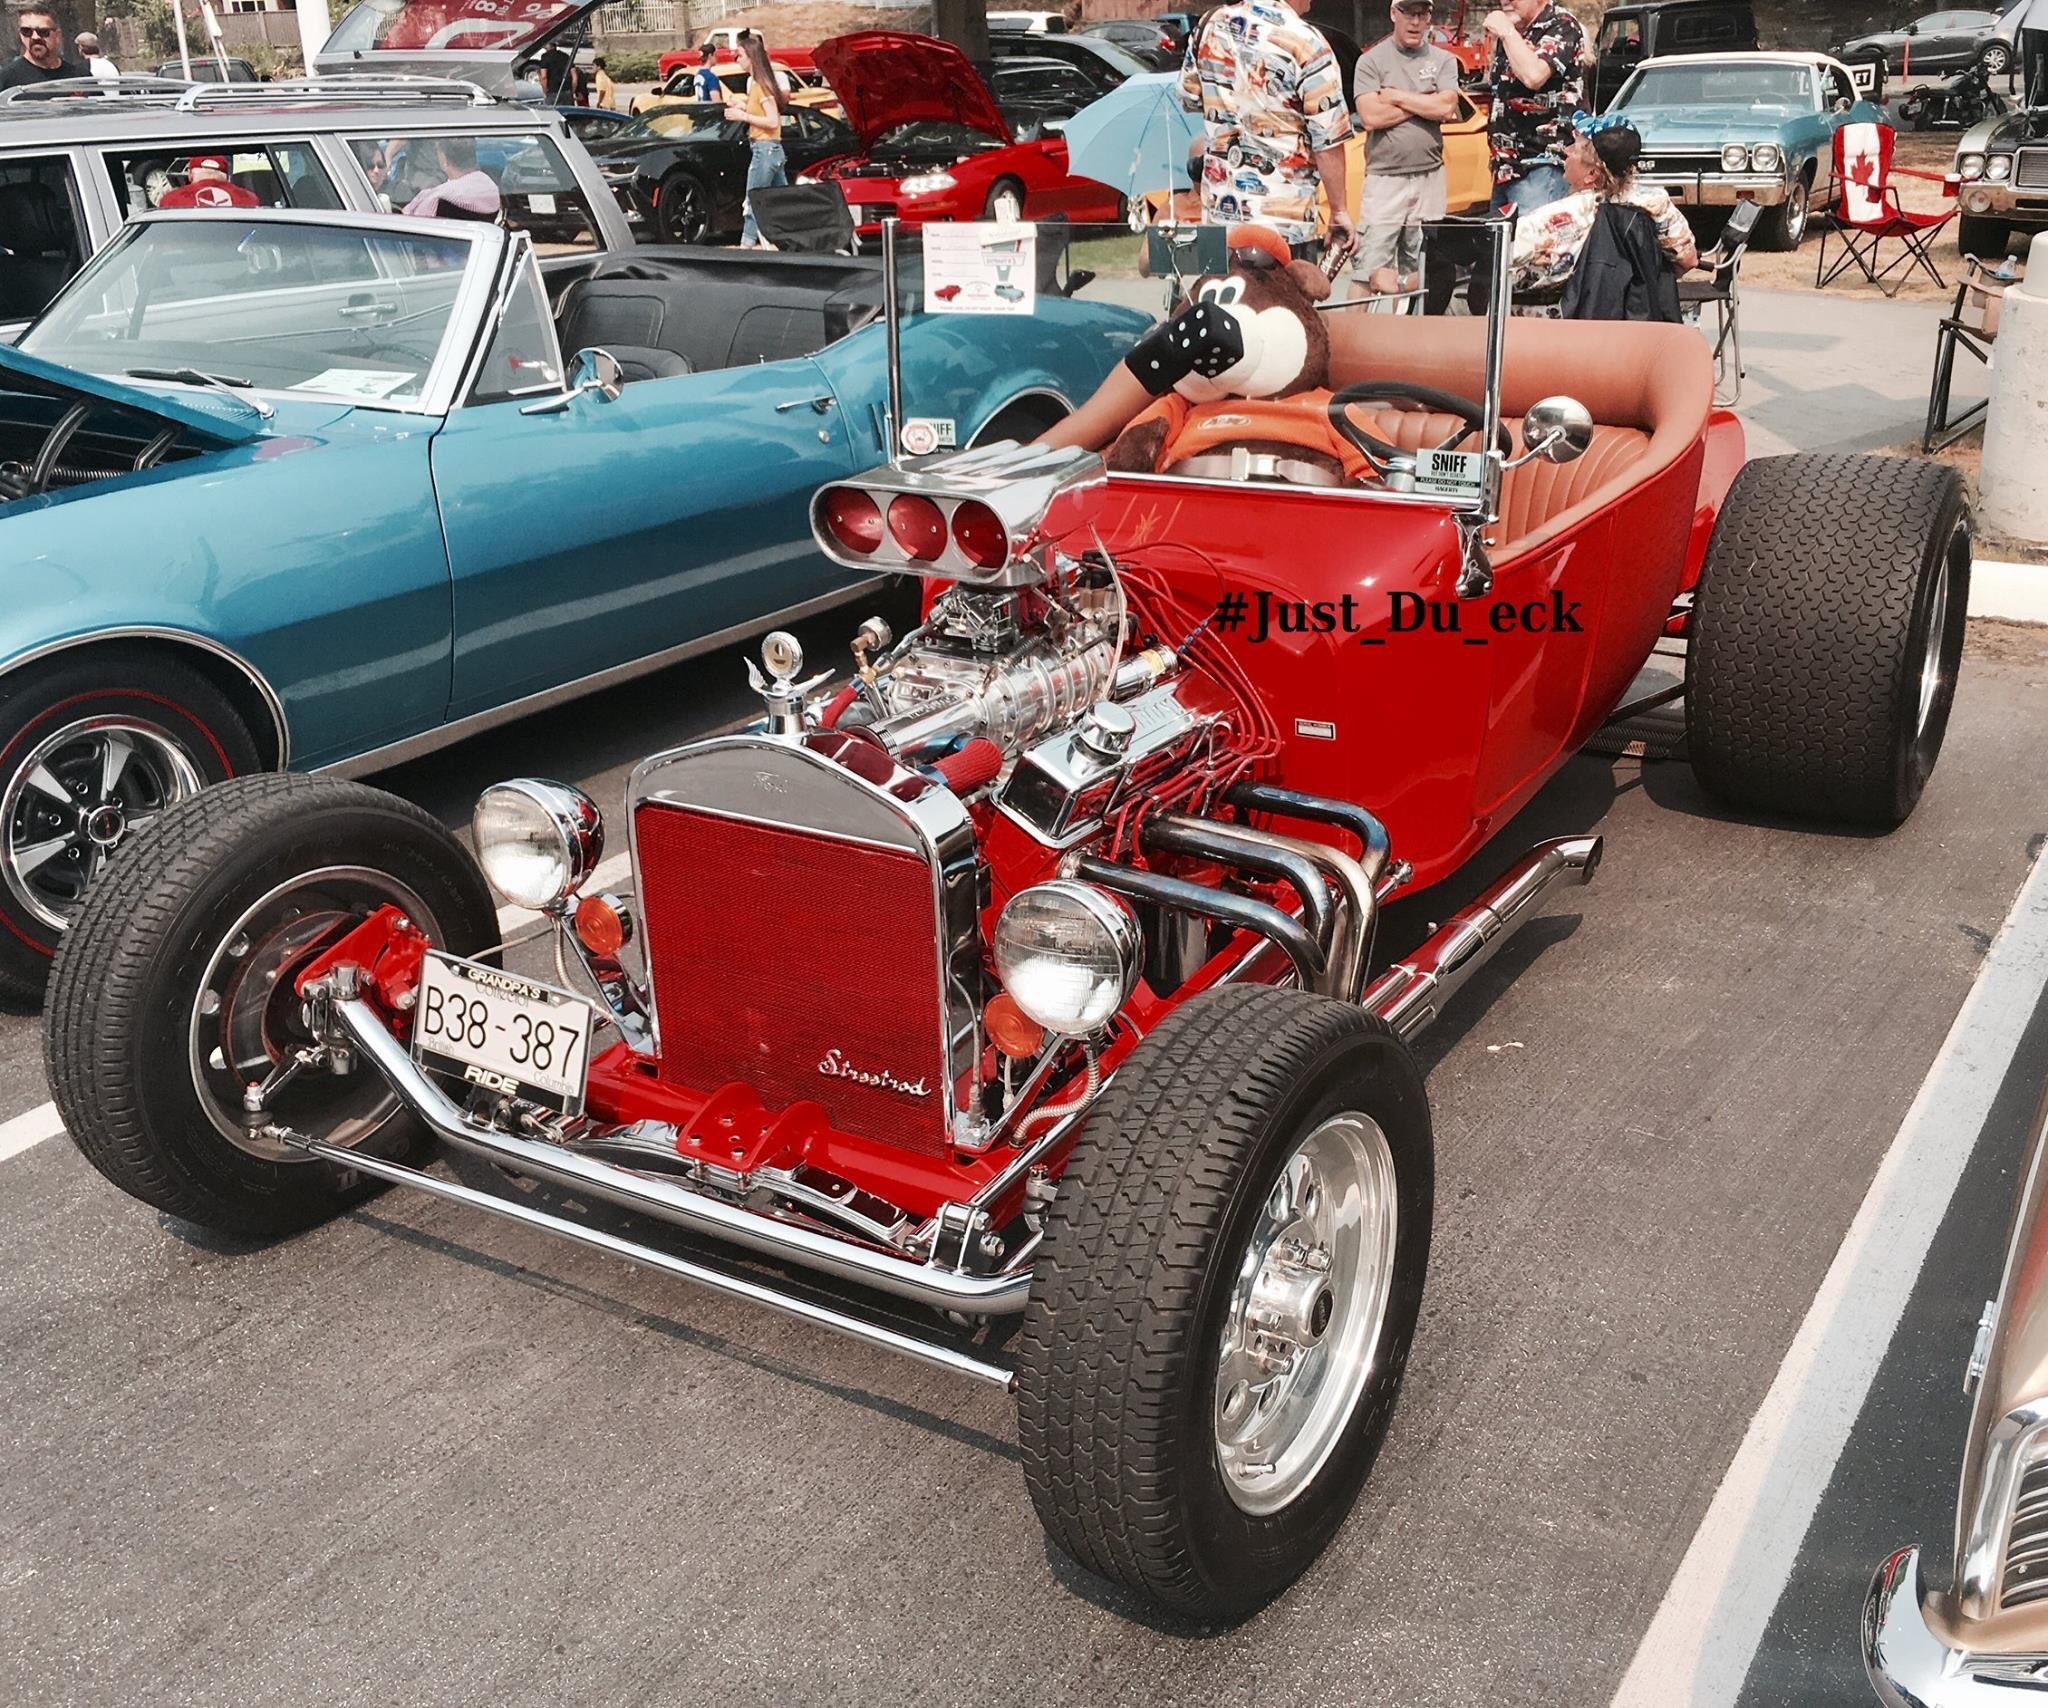 2017 #Dueck #Classic #Car #Show #Koolest #Convertible= Jack DeGrant 1923 #Ford T! #Just_Du_eck @urduecksalesgi1  @BeckyChernek @bryans_cars @kmandei3 @OldSchRides @wildbillphoto #Classiccars #FordCanada #FordT #RedRocketCollection https://t.co/Afxe6cGGOj